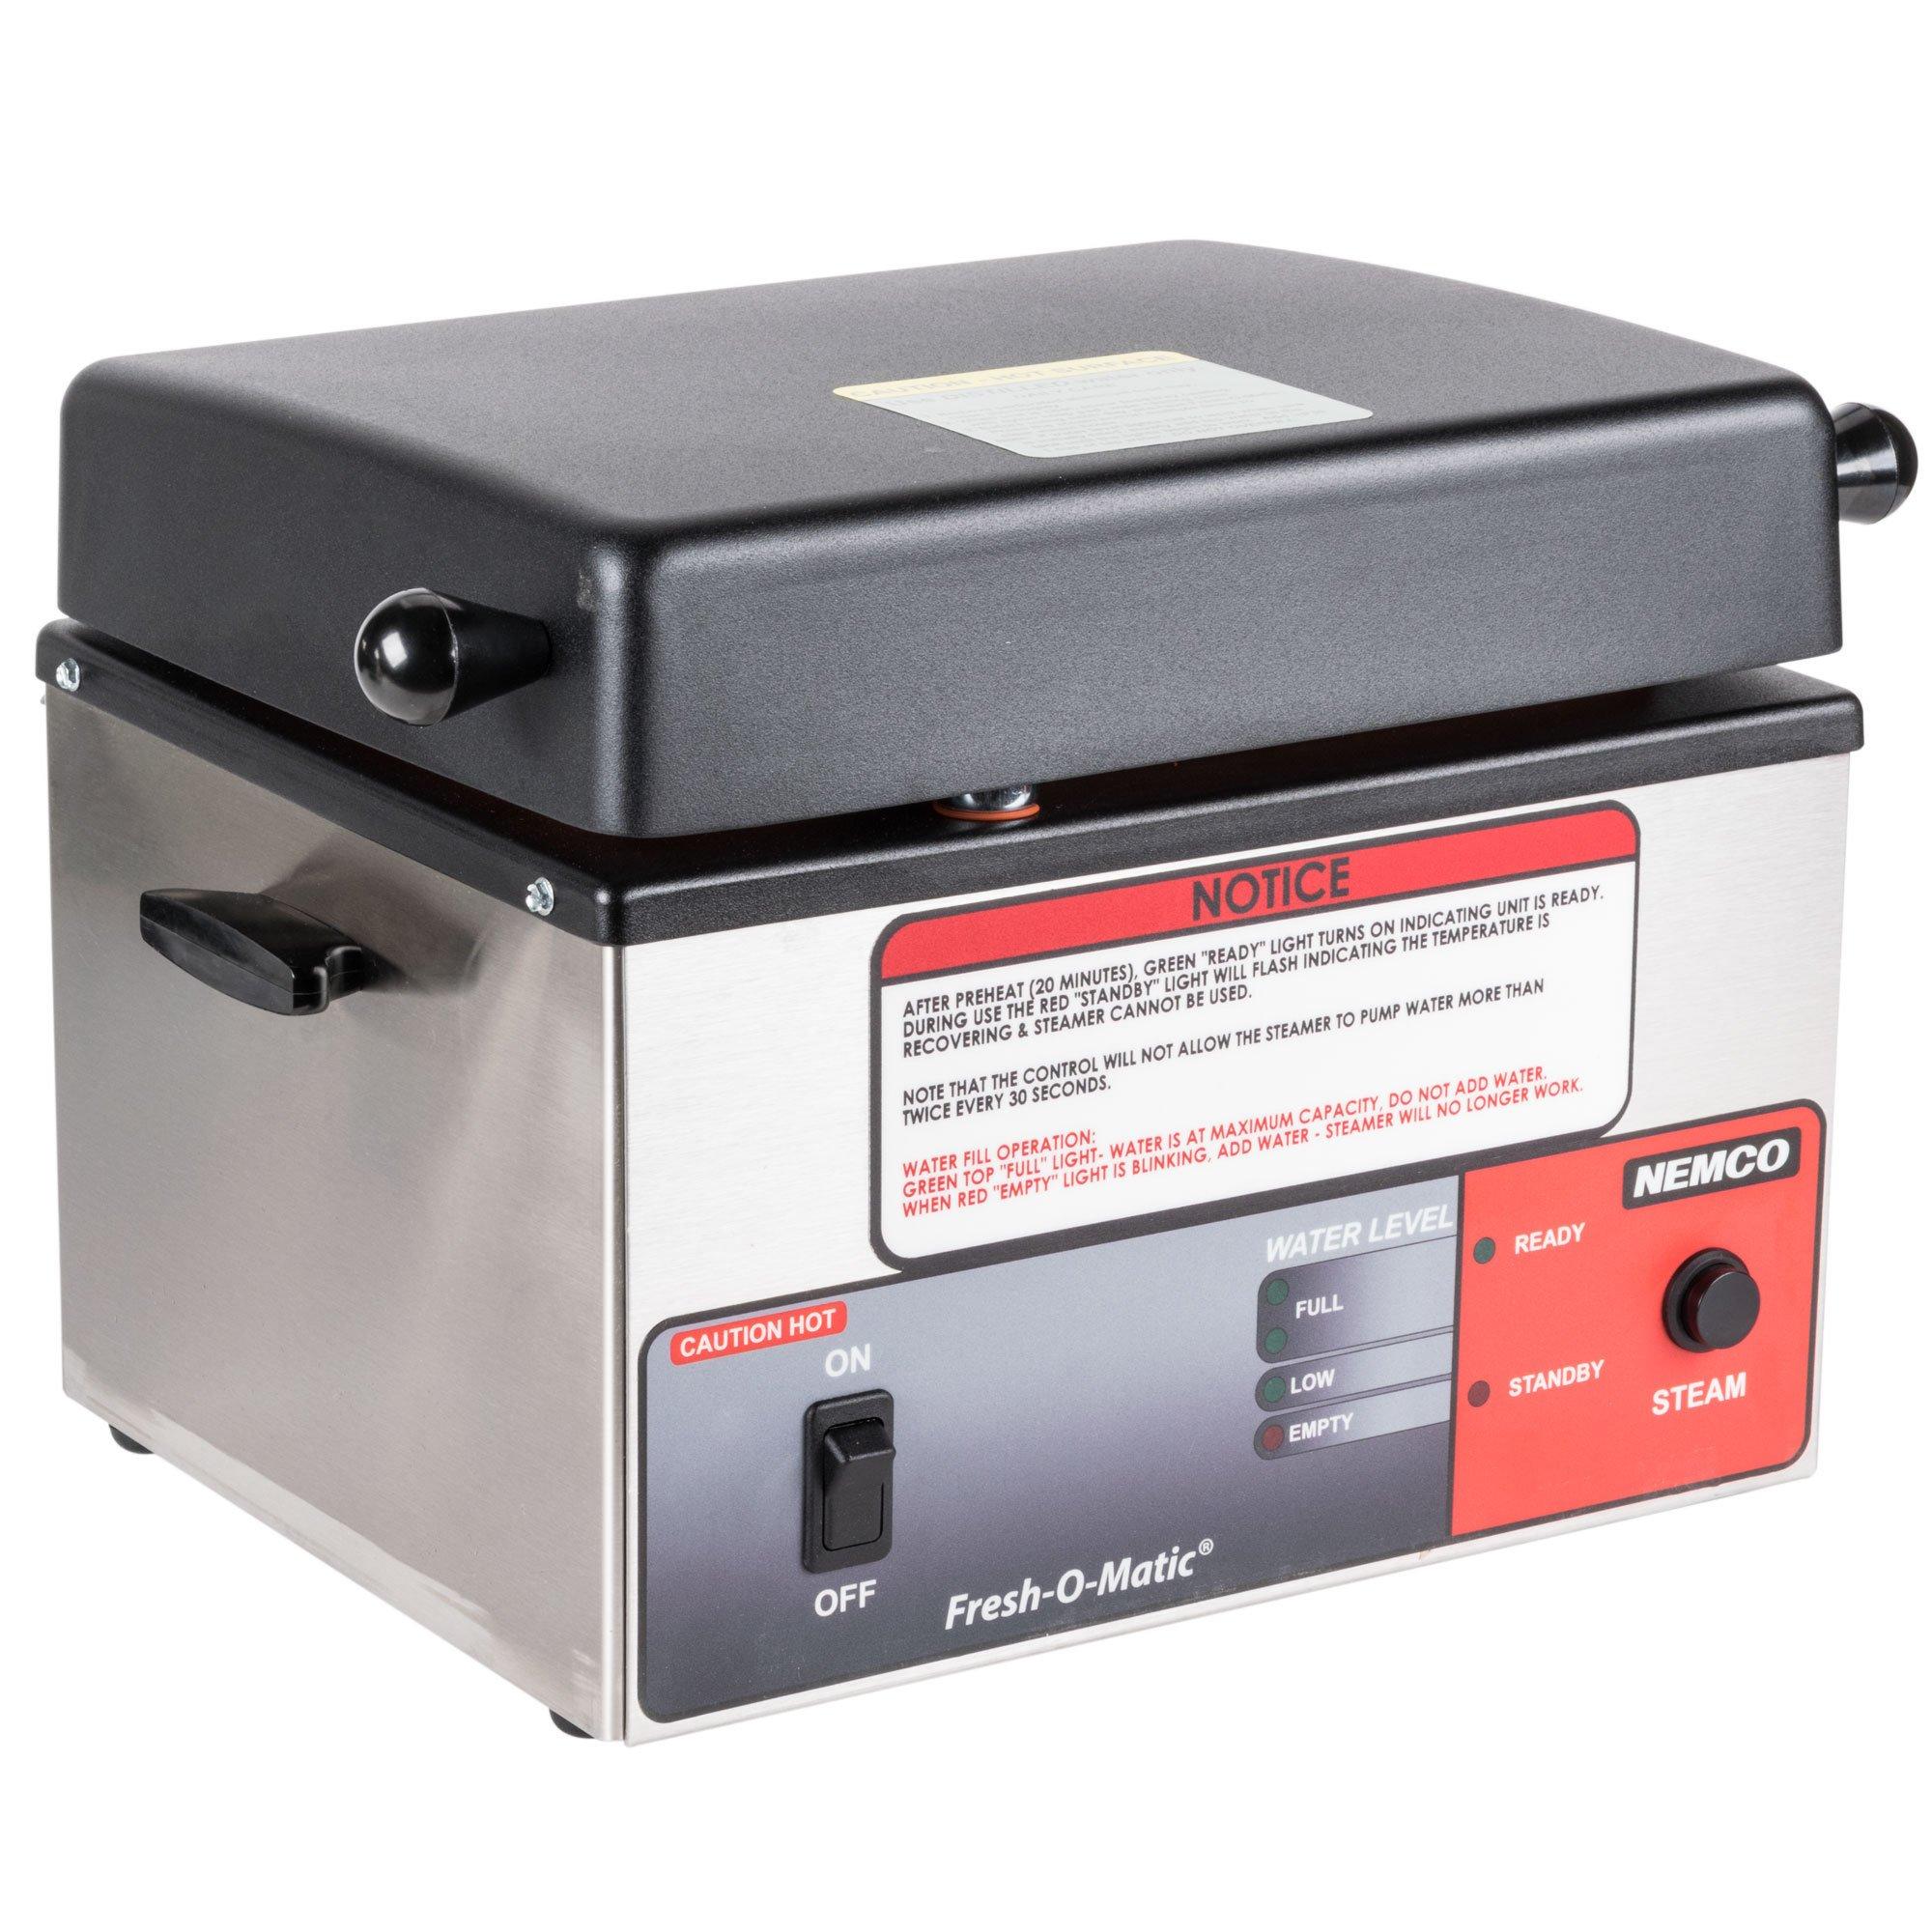 Nemco 6625 Nemco 6625 - Fresh-O-Matic Steamer